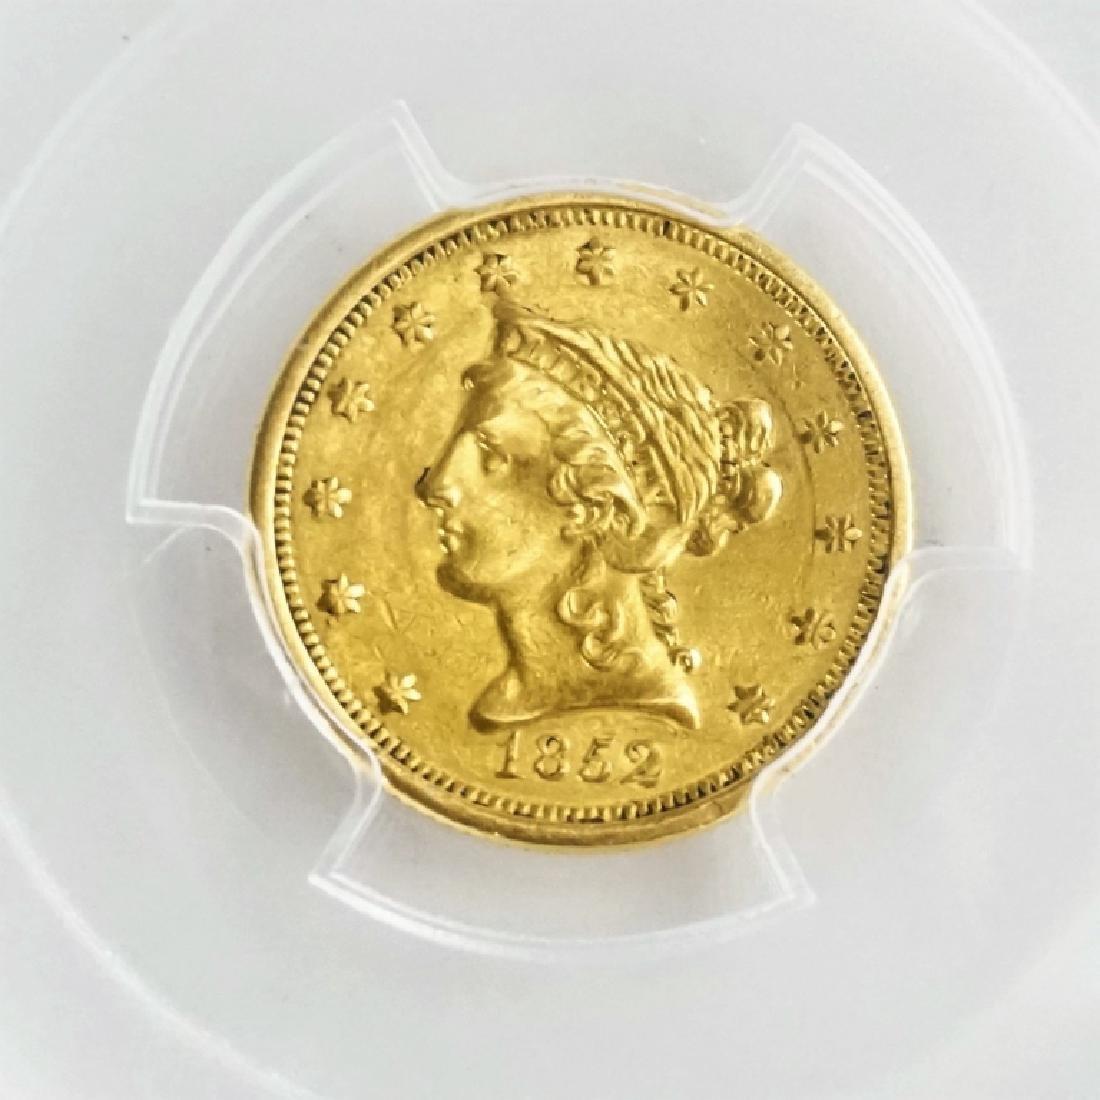 1852-O U.S. QUARTER EAGLE $2.50 GOLD COIN - 3